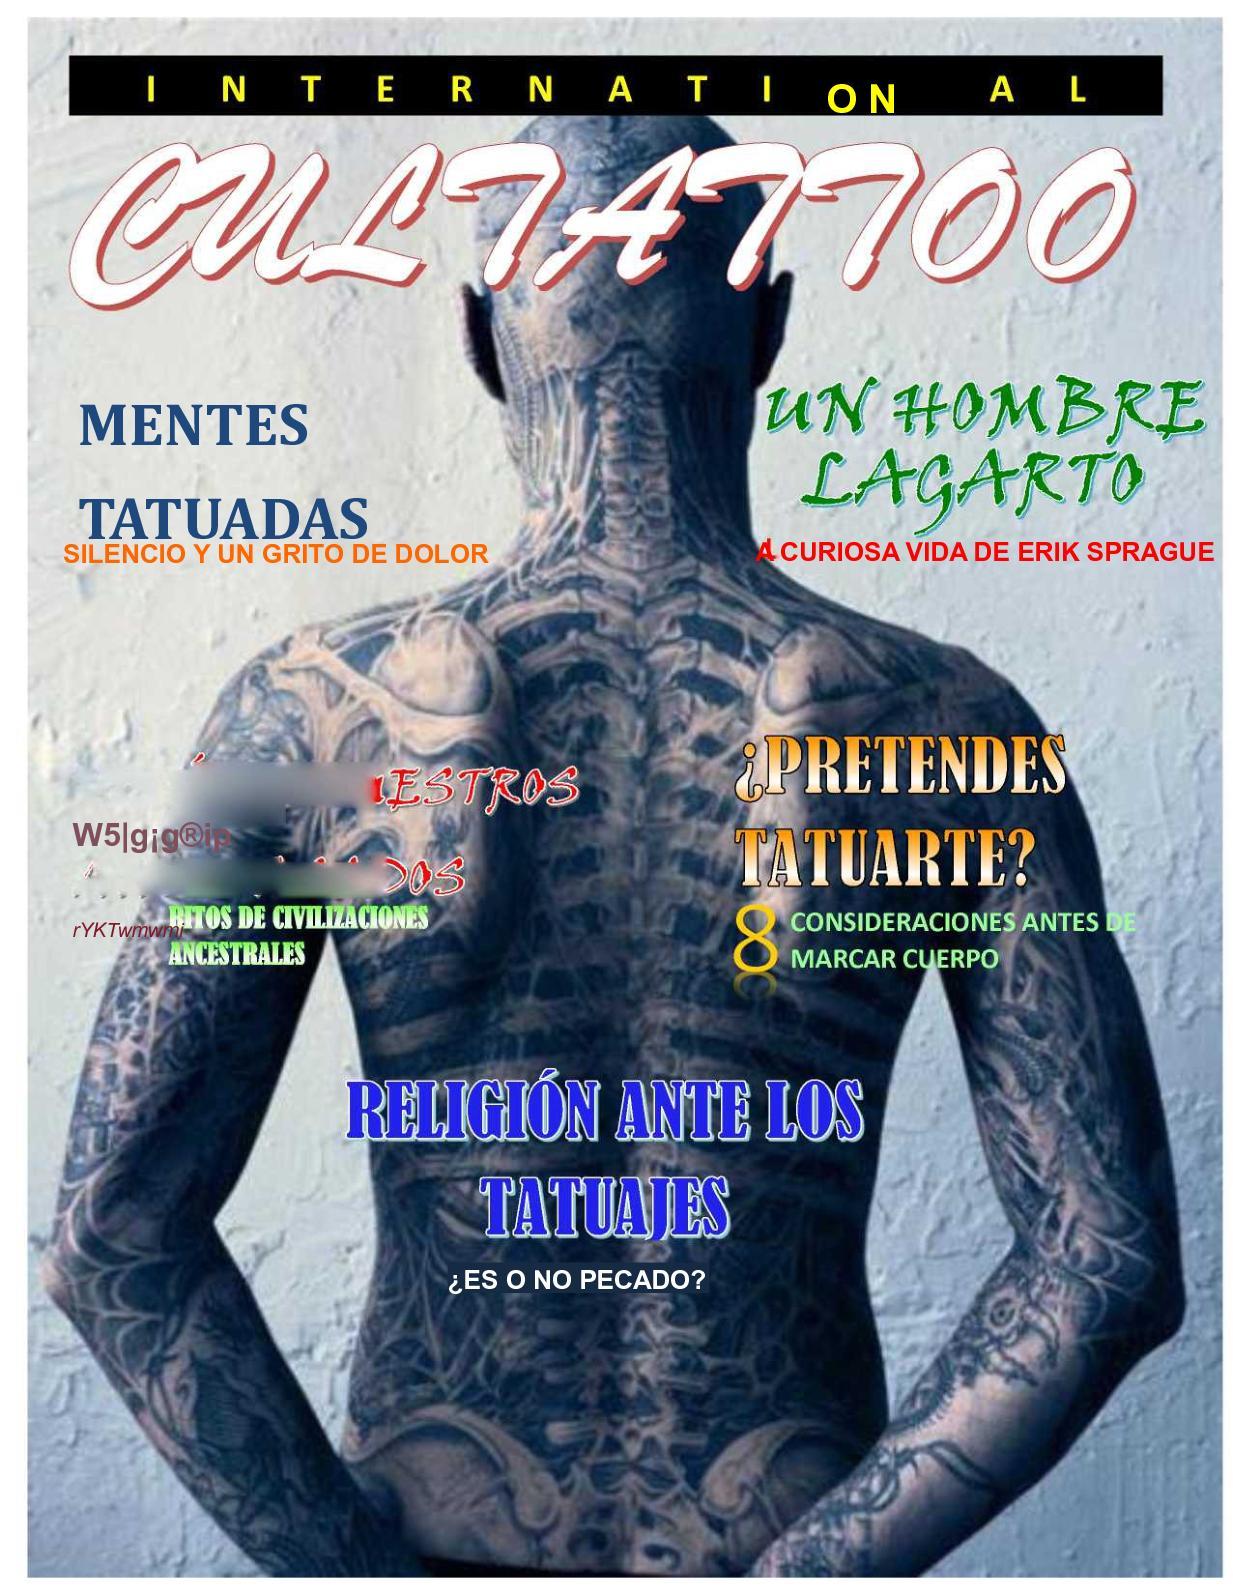 Calaméo - Cultattoo